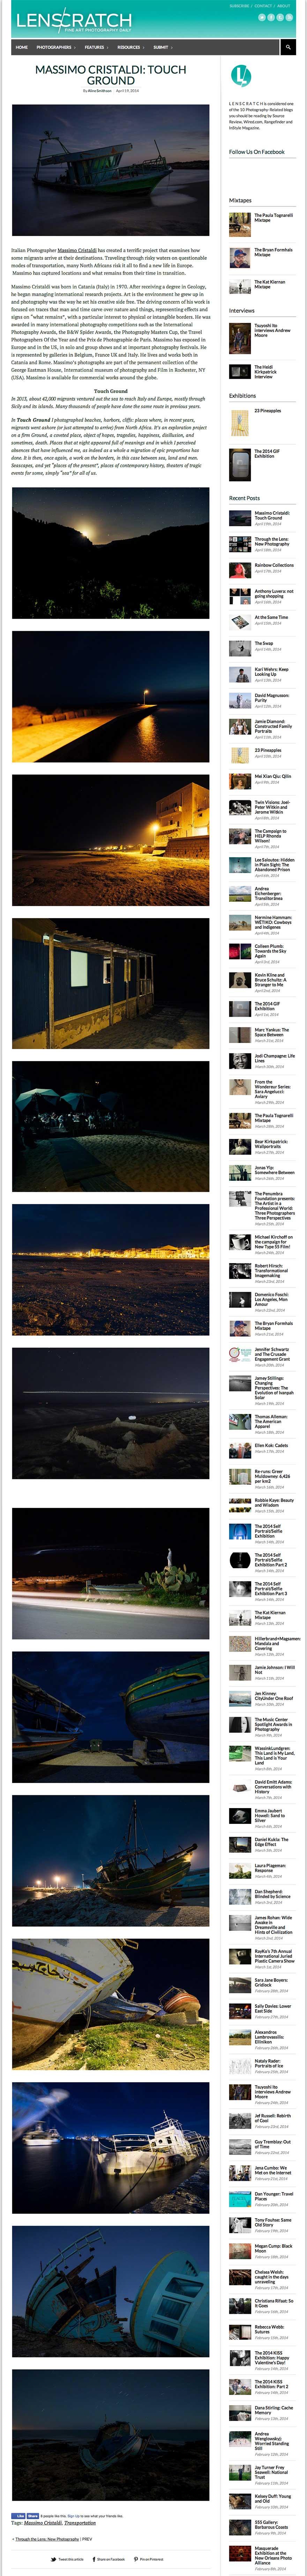 LENSCRATCH-_-Fine-Art-Photography-Daily-Massimo-Cristaldi-Touch-Ground